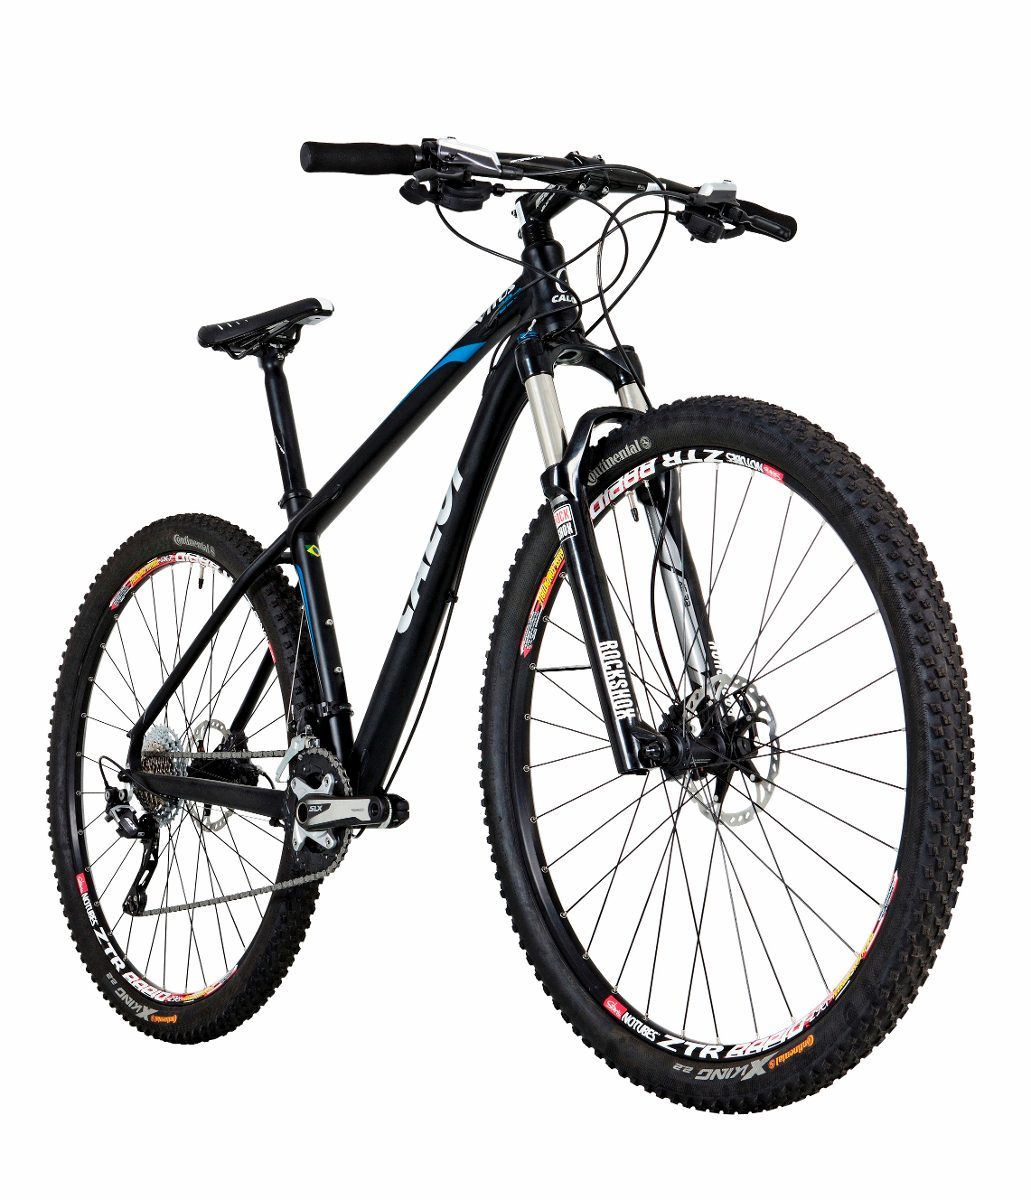 b392e8b0d Bicicleta Caloi Vitus Aro 29 Shimano Slx Quadro 15